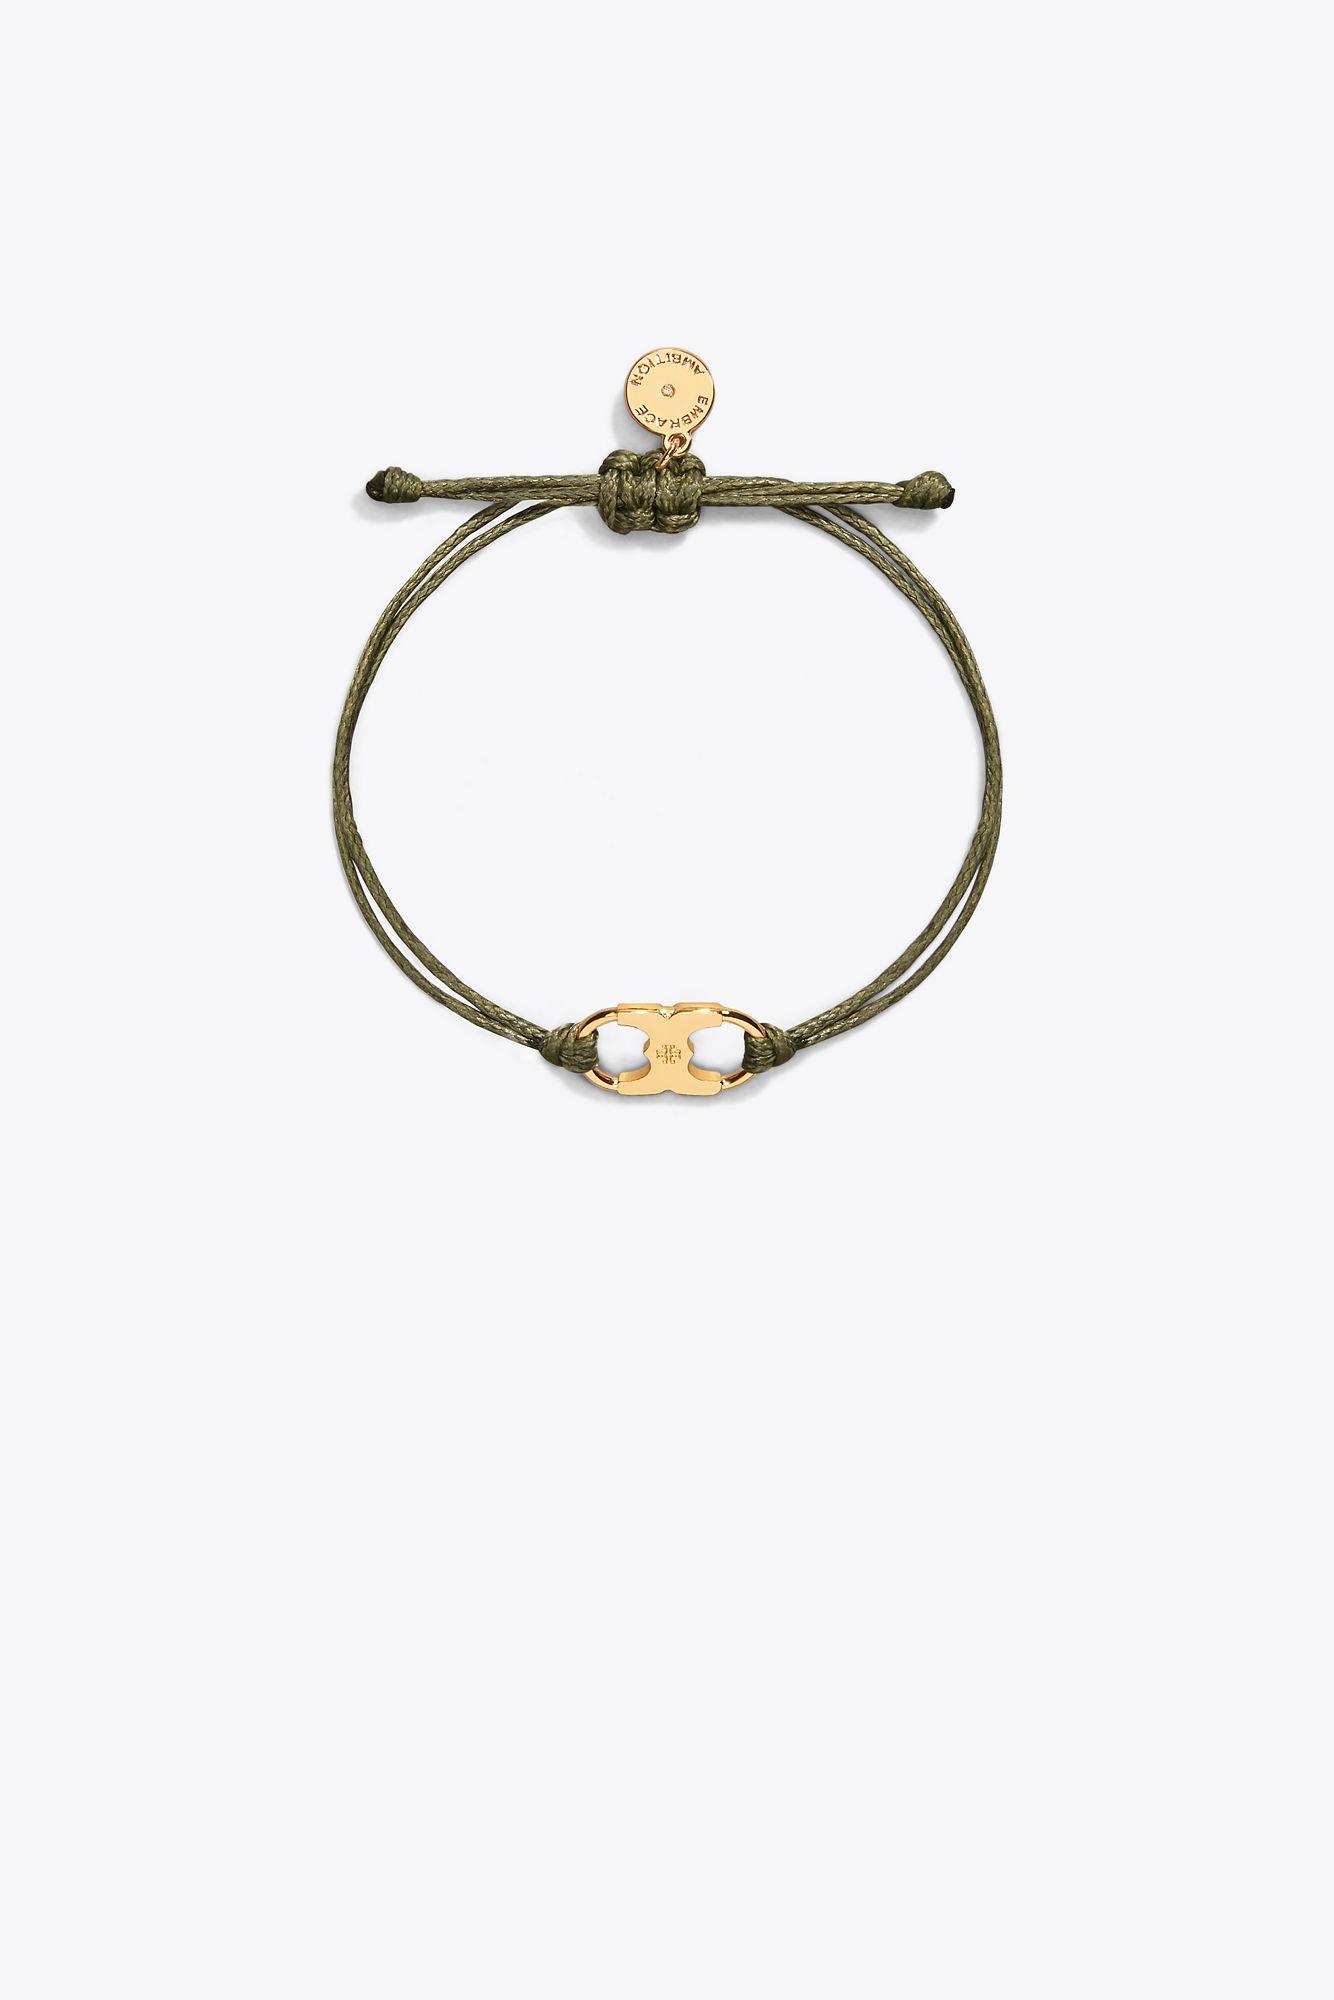 7dd6b714f808c Tory Burch Metallic Embrace Ambition Bracelet